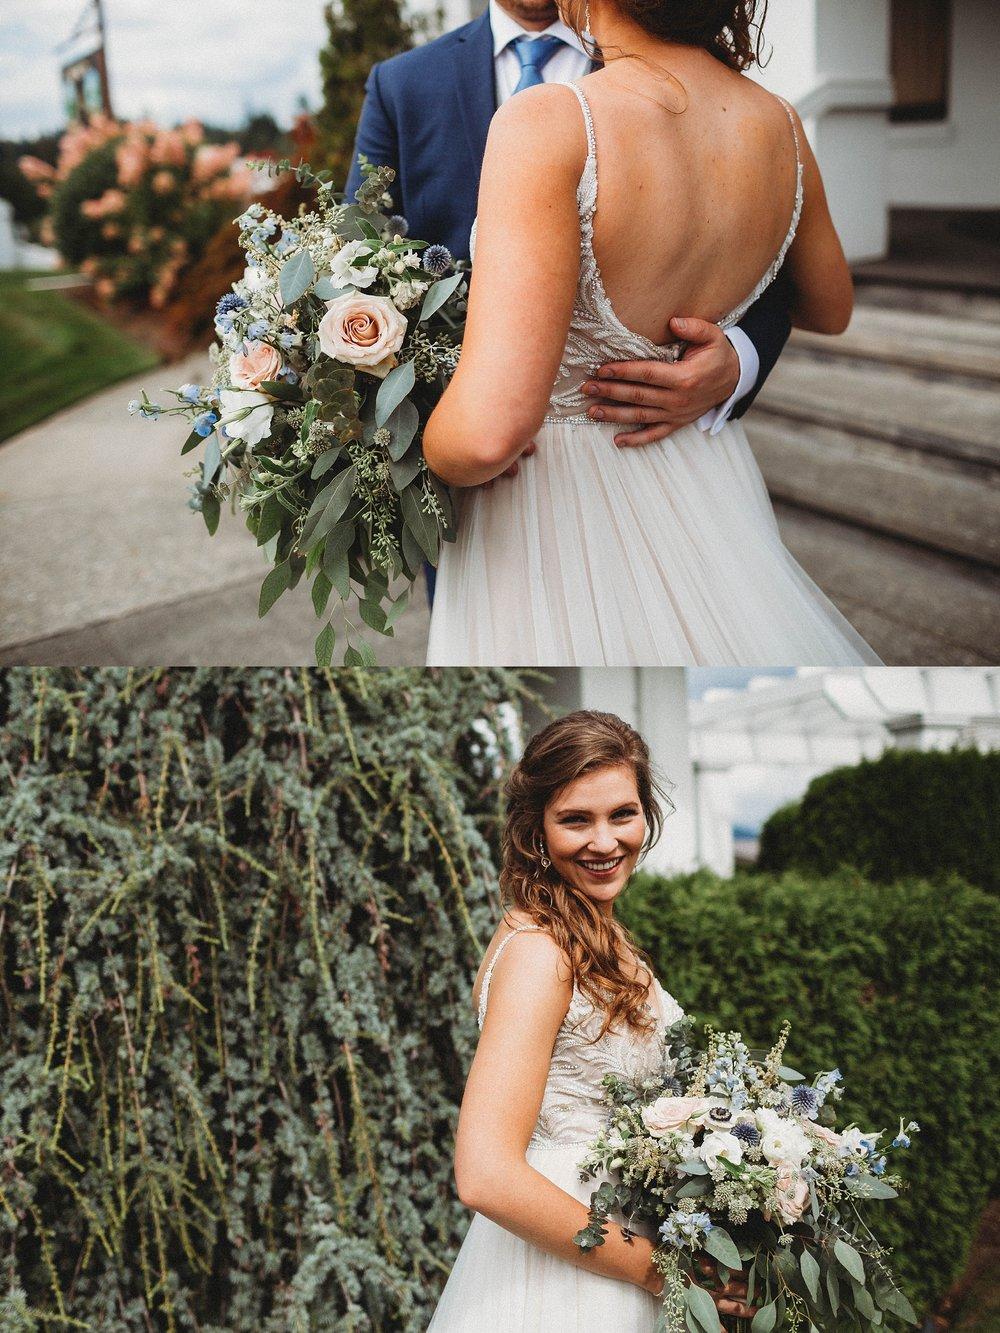 olson mansion wedding photography - jill and garrett - ashley vos photography - seattle area wedding photographer-24.jpg